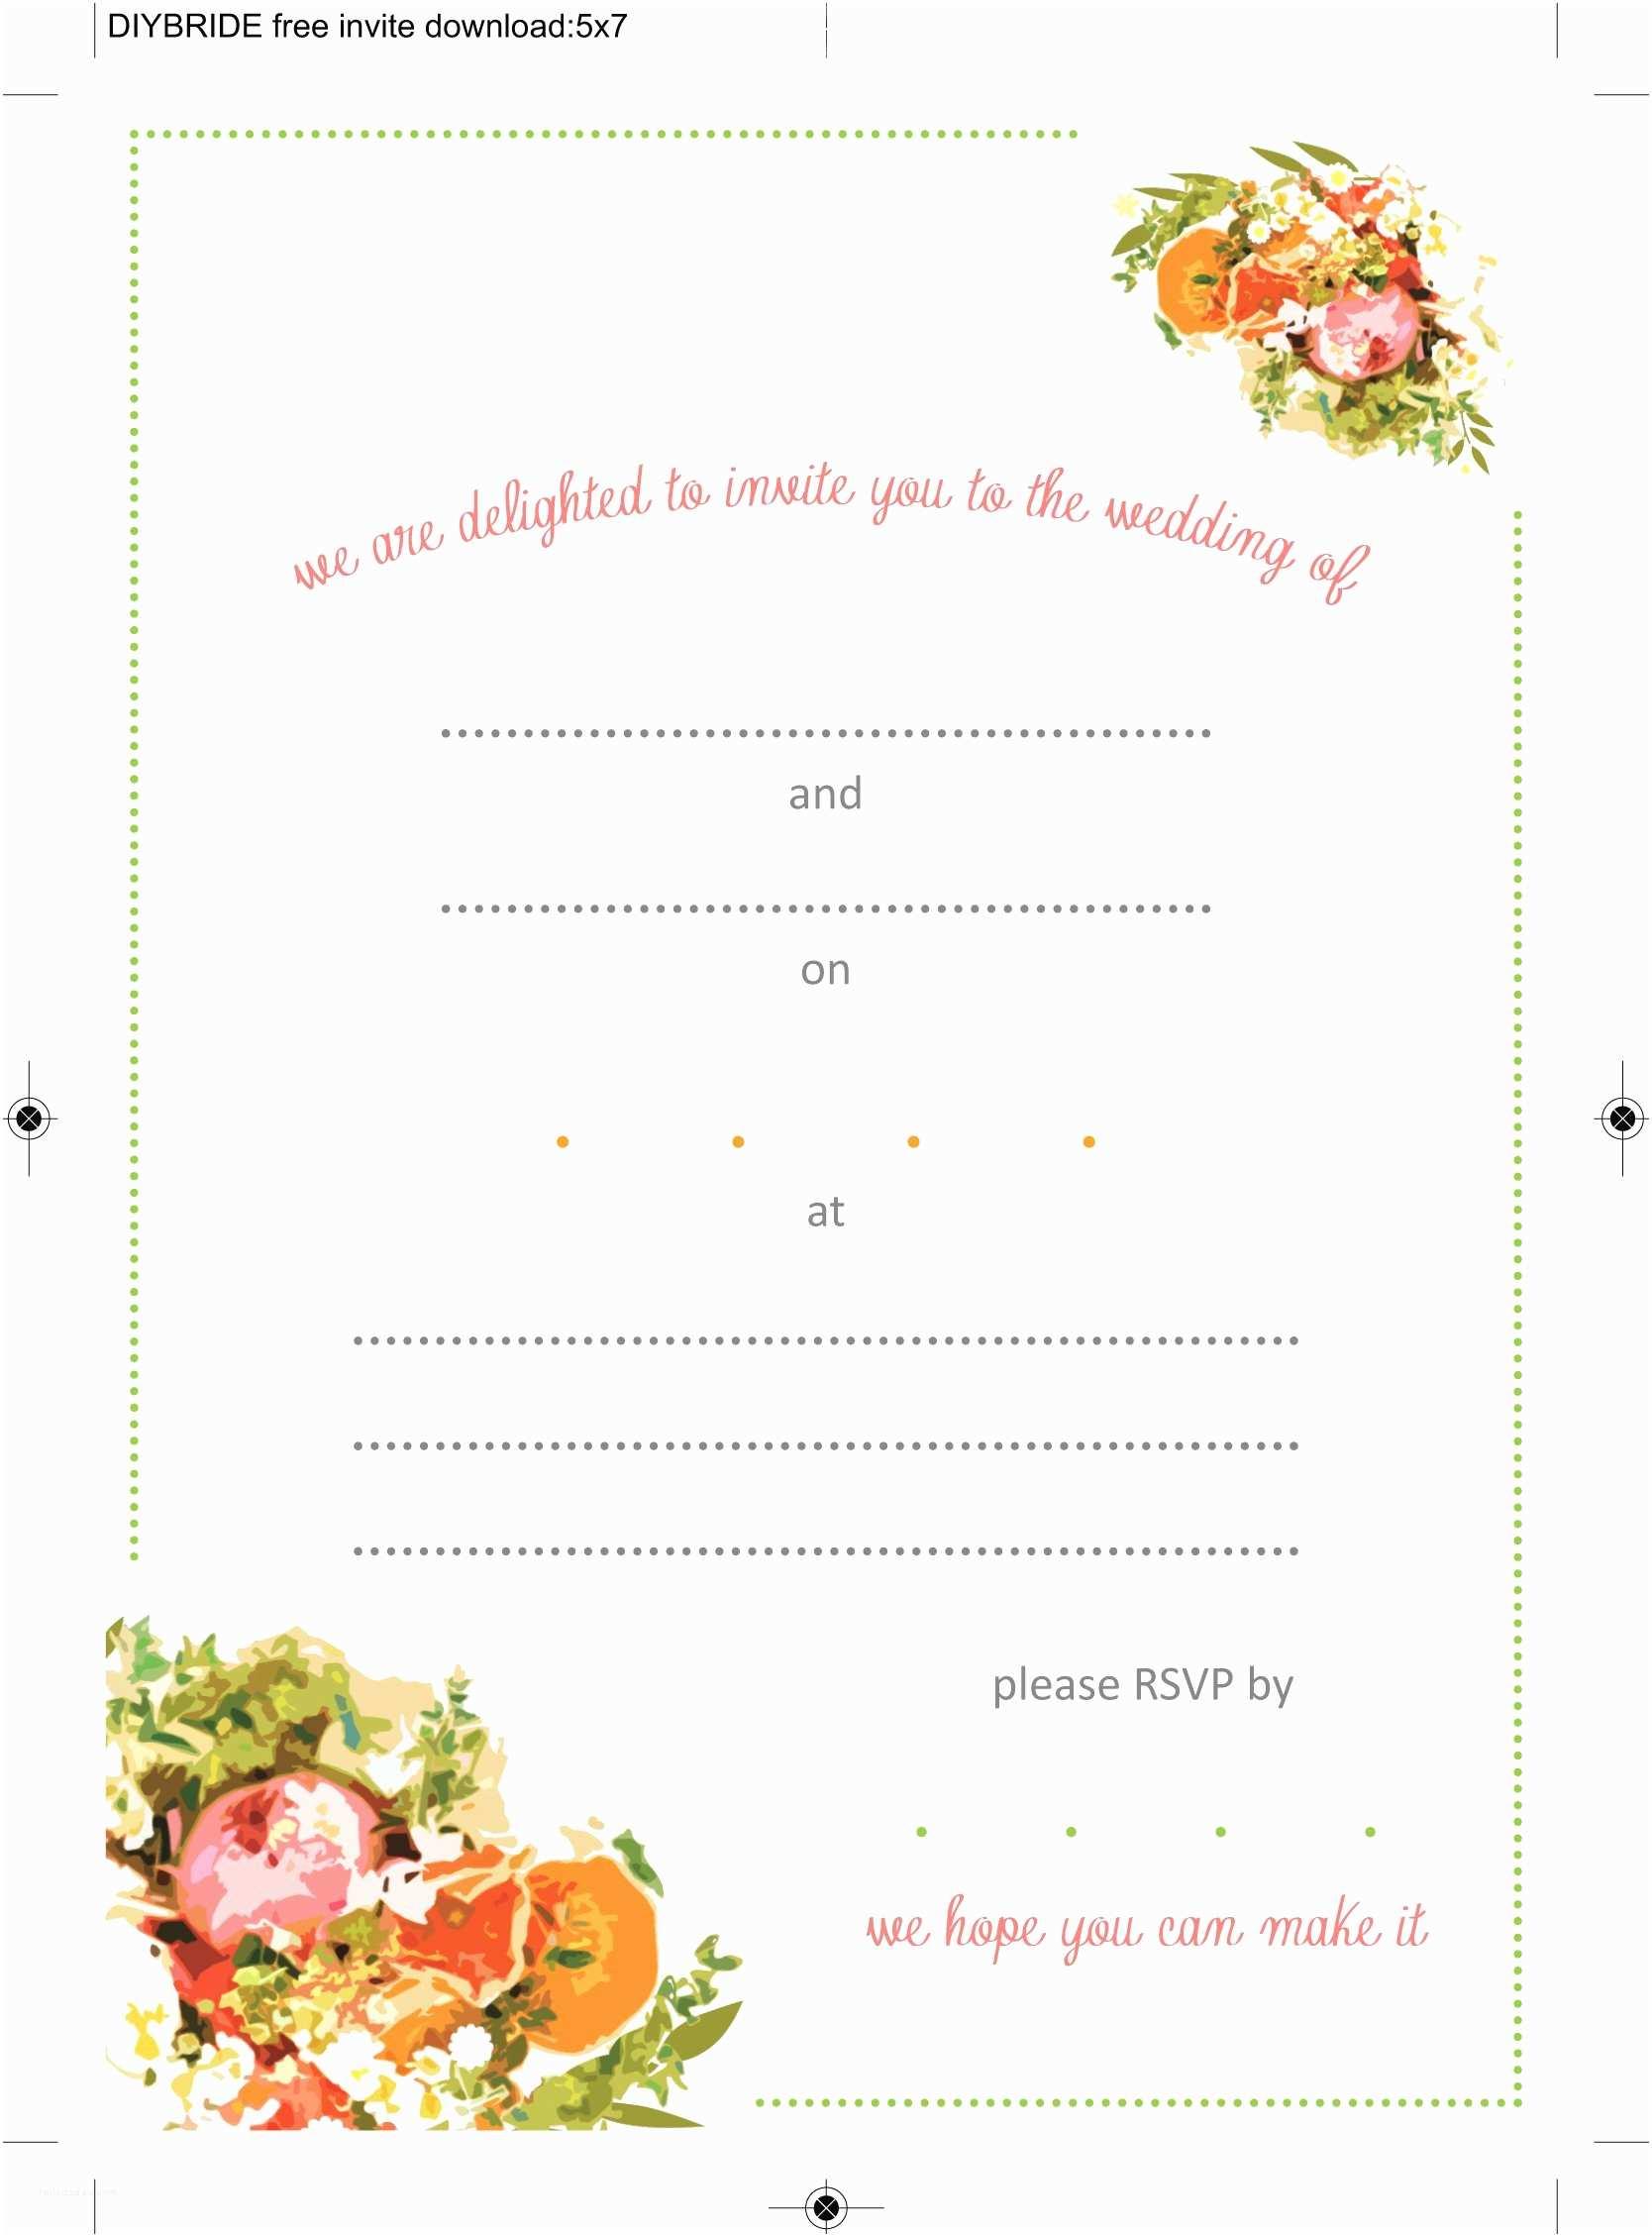 Free Printable Wedding Invitation Templates for Microsoft Word Free Printable Wedding Invitation Templates Download